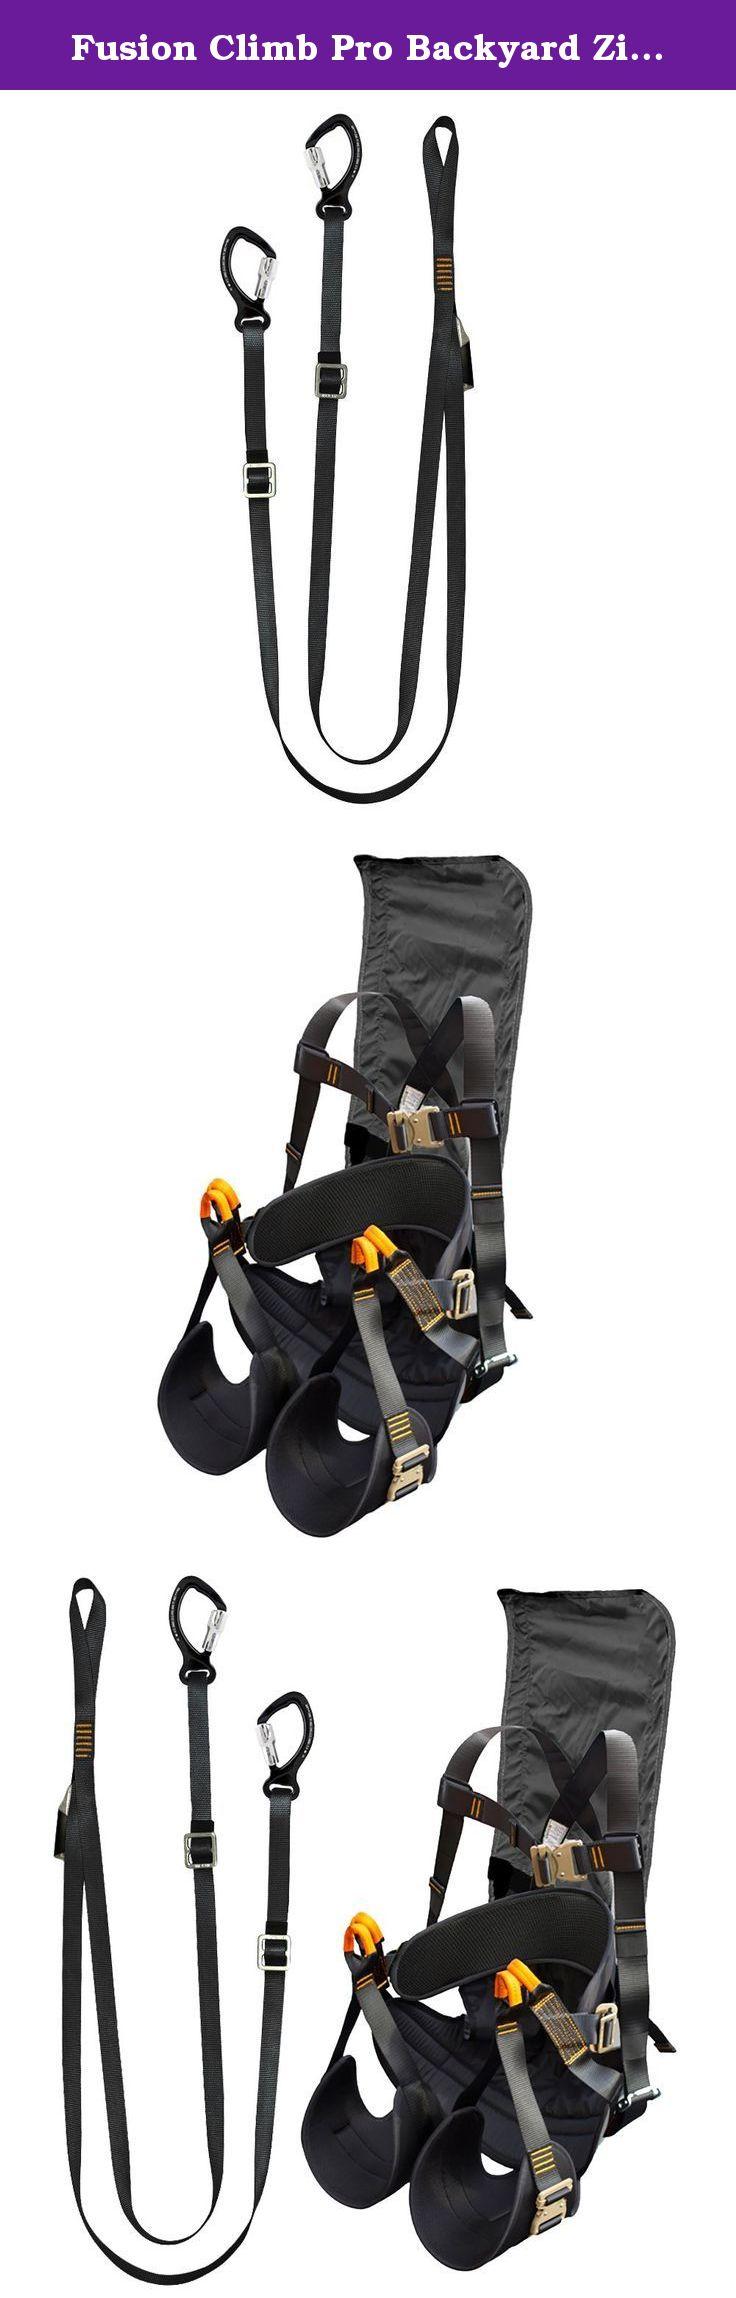 fusion climb pro backyard zip fk a hl 15 line kit harness lanyard